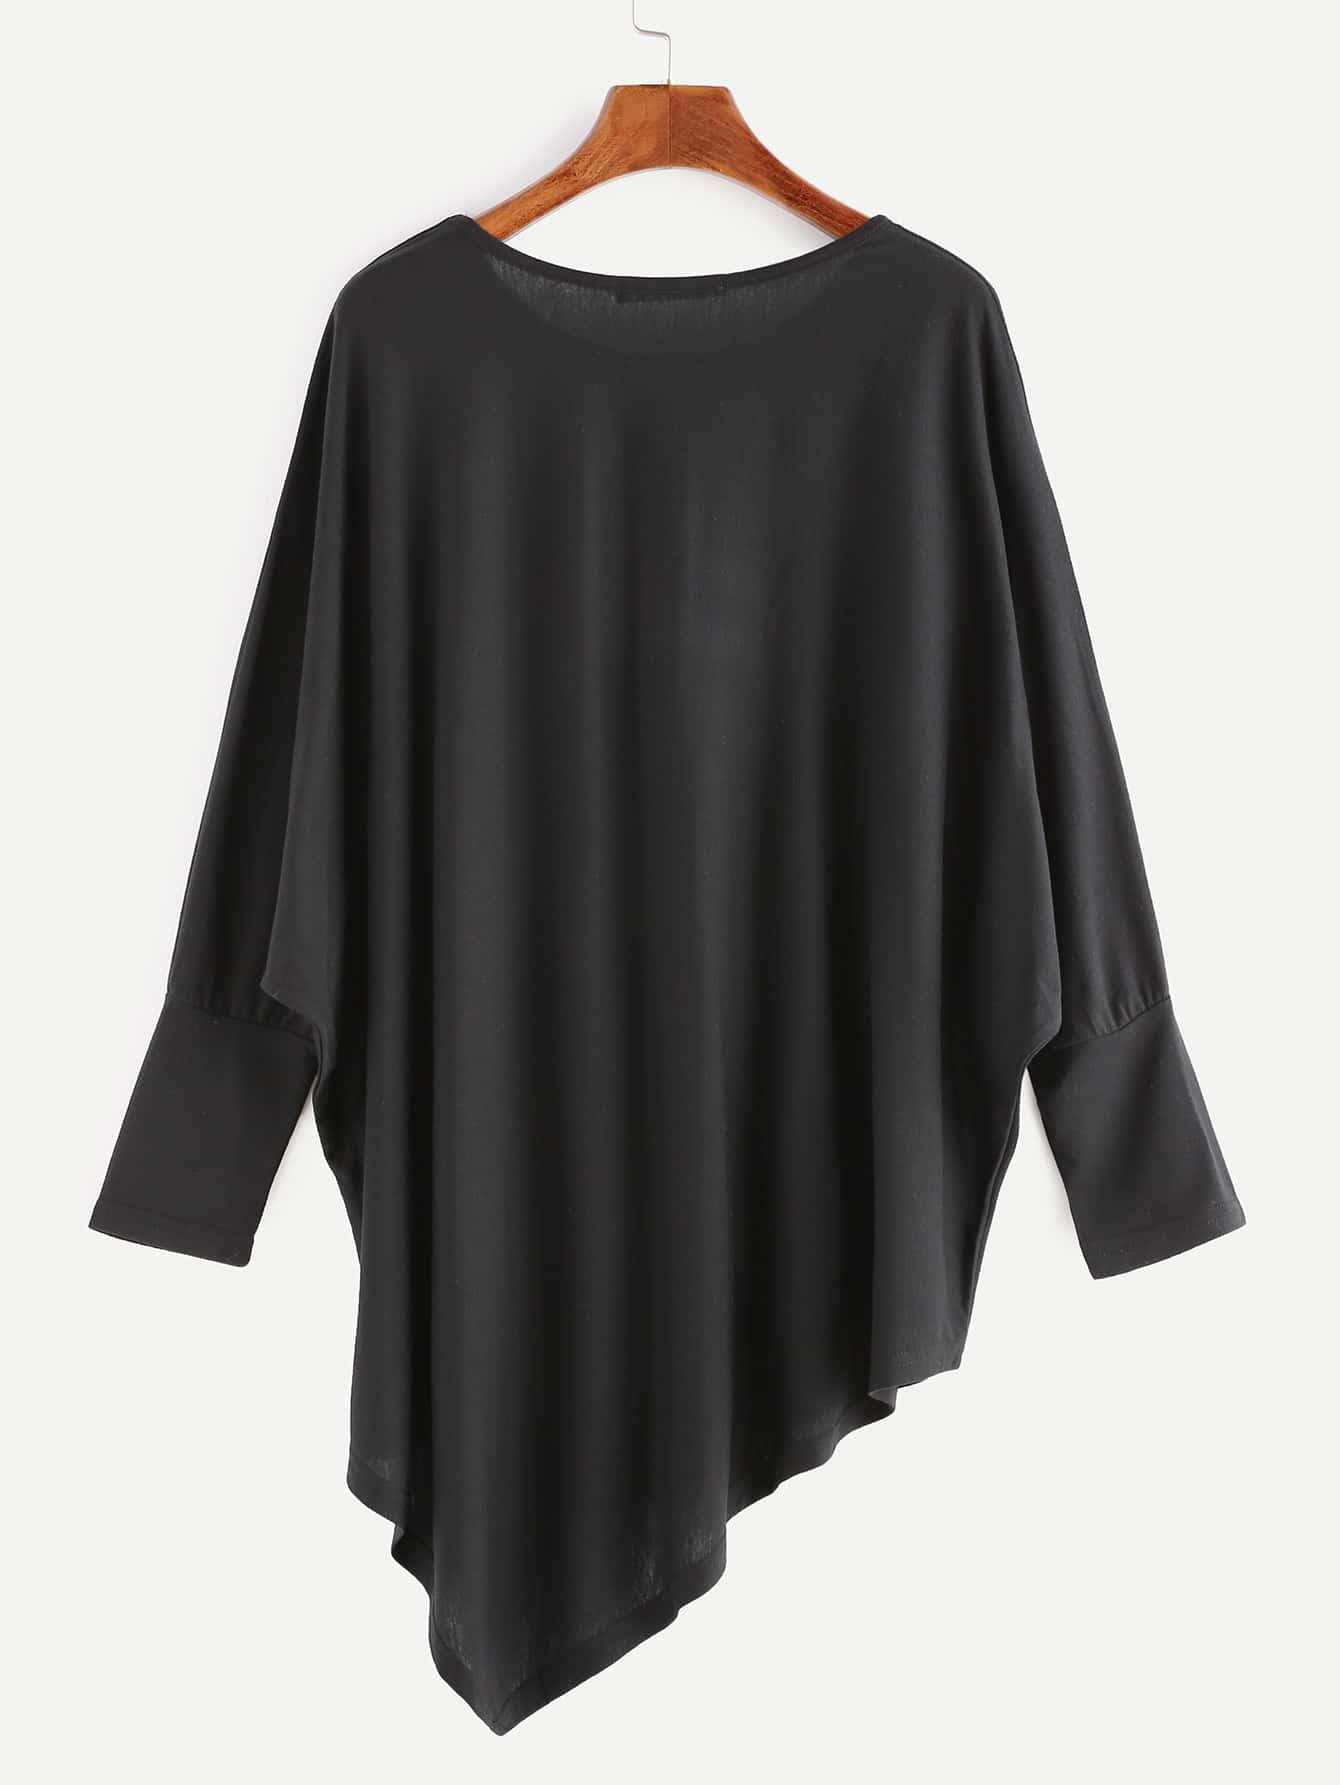 Sizes queen Belted High Waist Lace Panel Maxi Dress size online shop resale